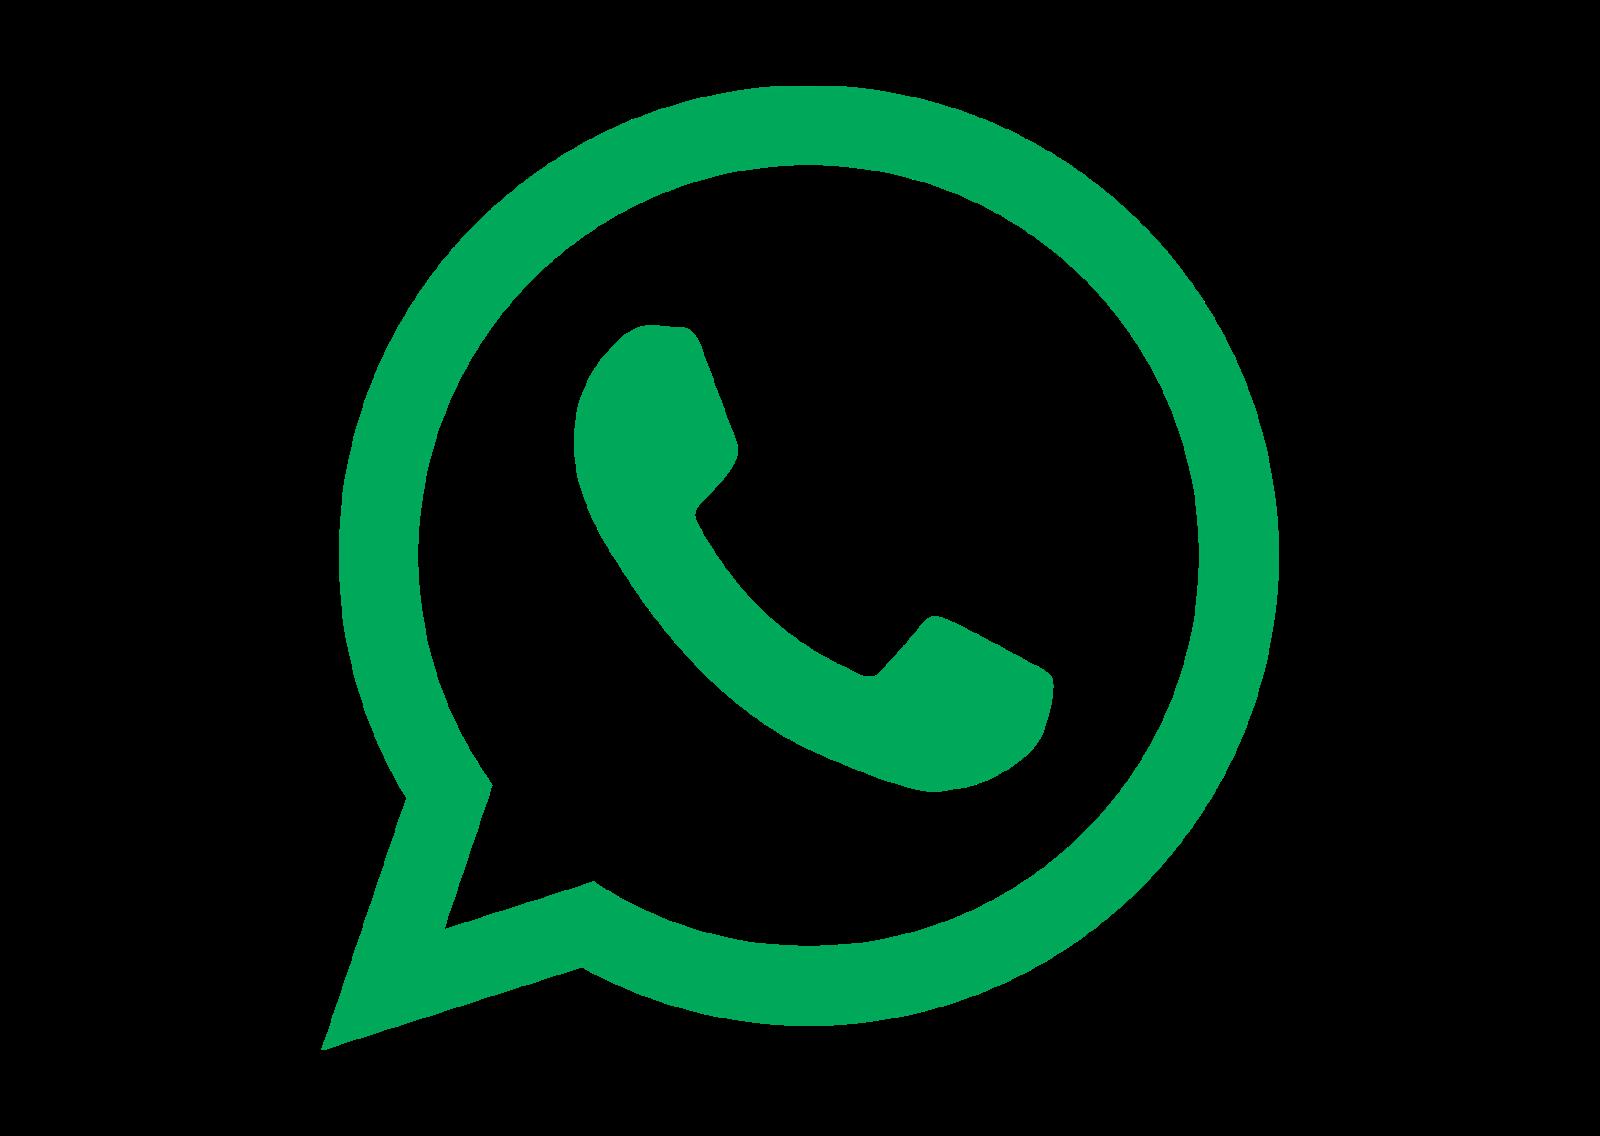 Whatsapp Logo Light Green Png 2259 Free Transparent Png